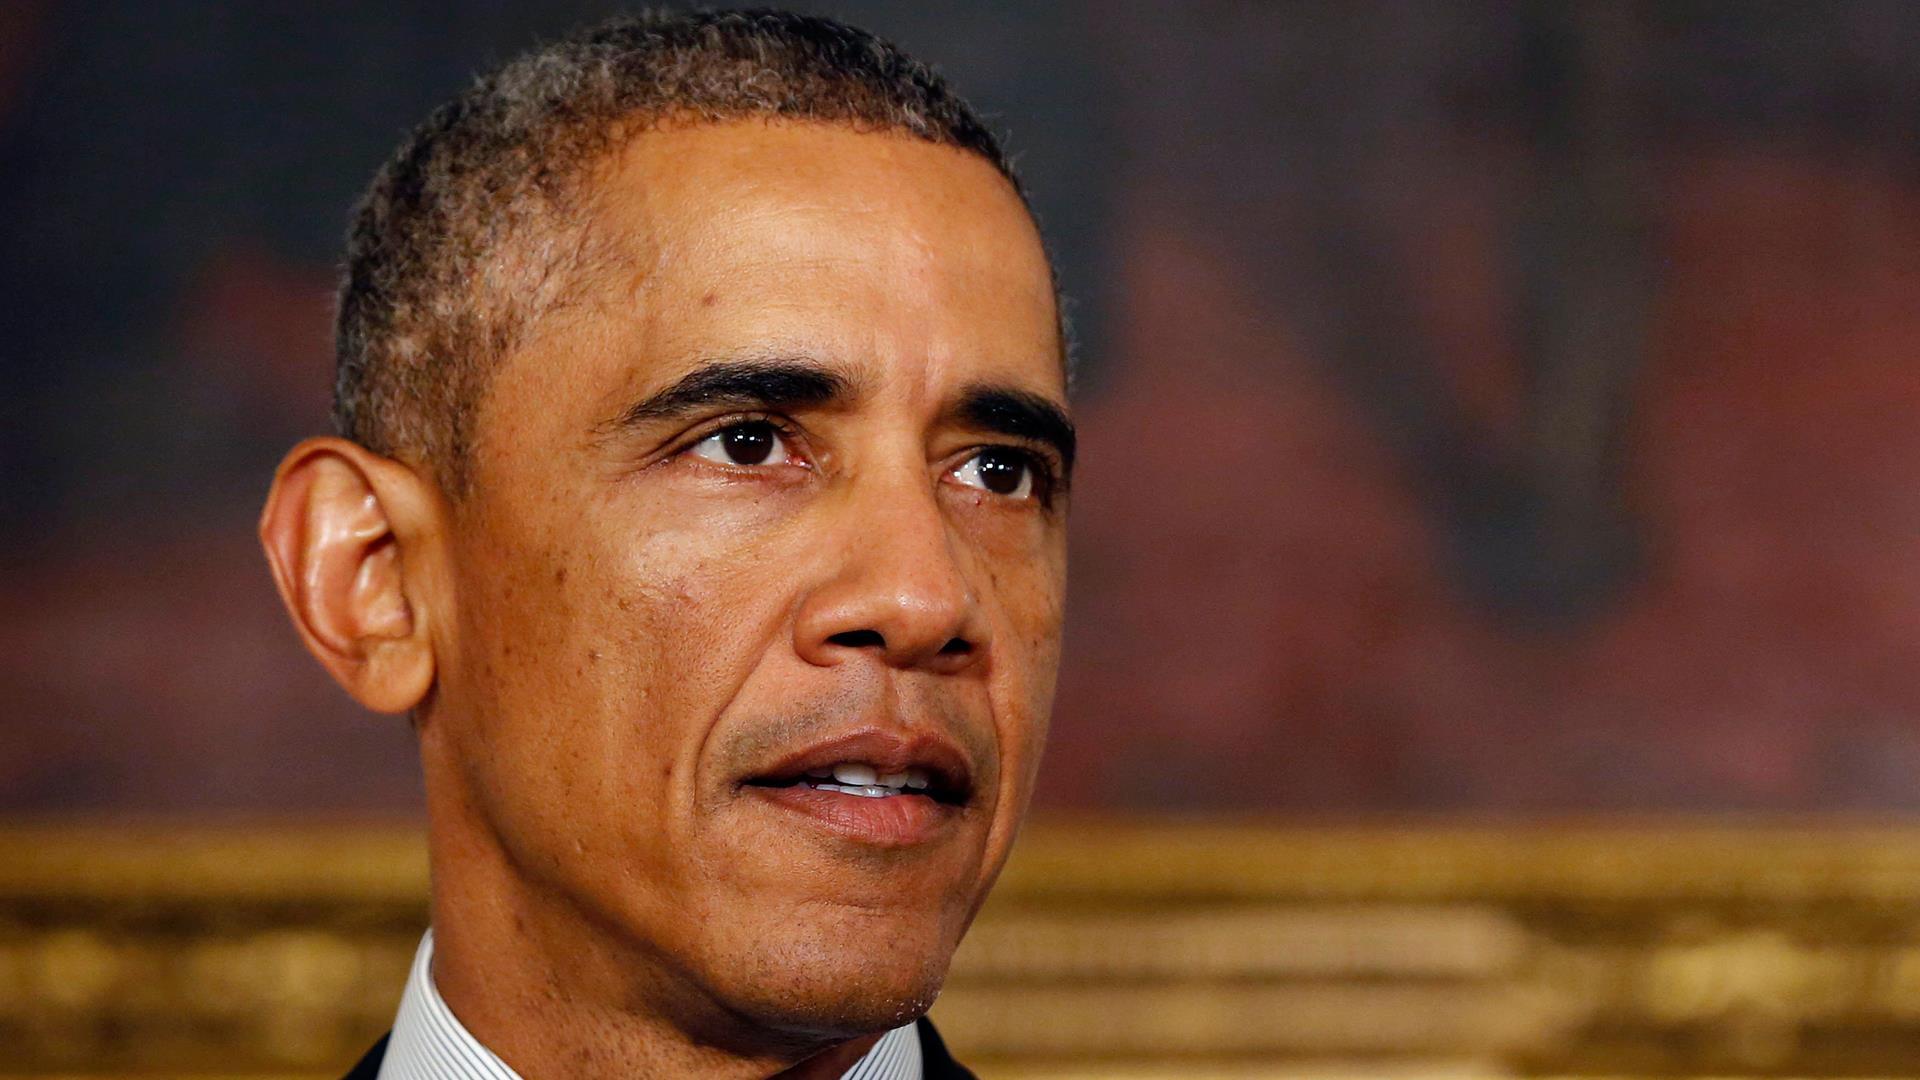 Watch Live: Obama Speaks After